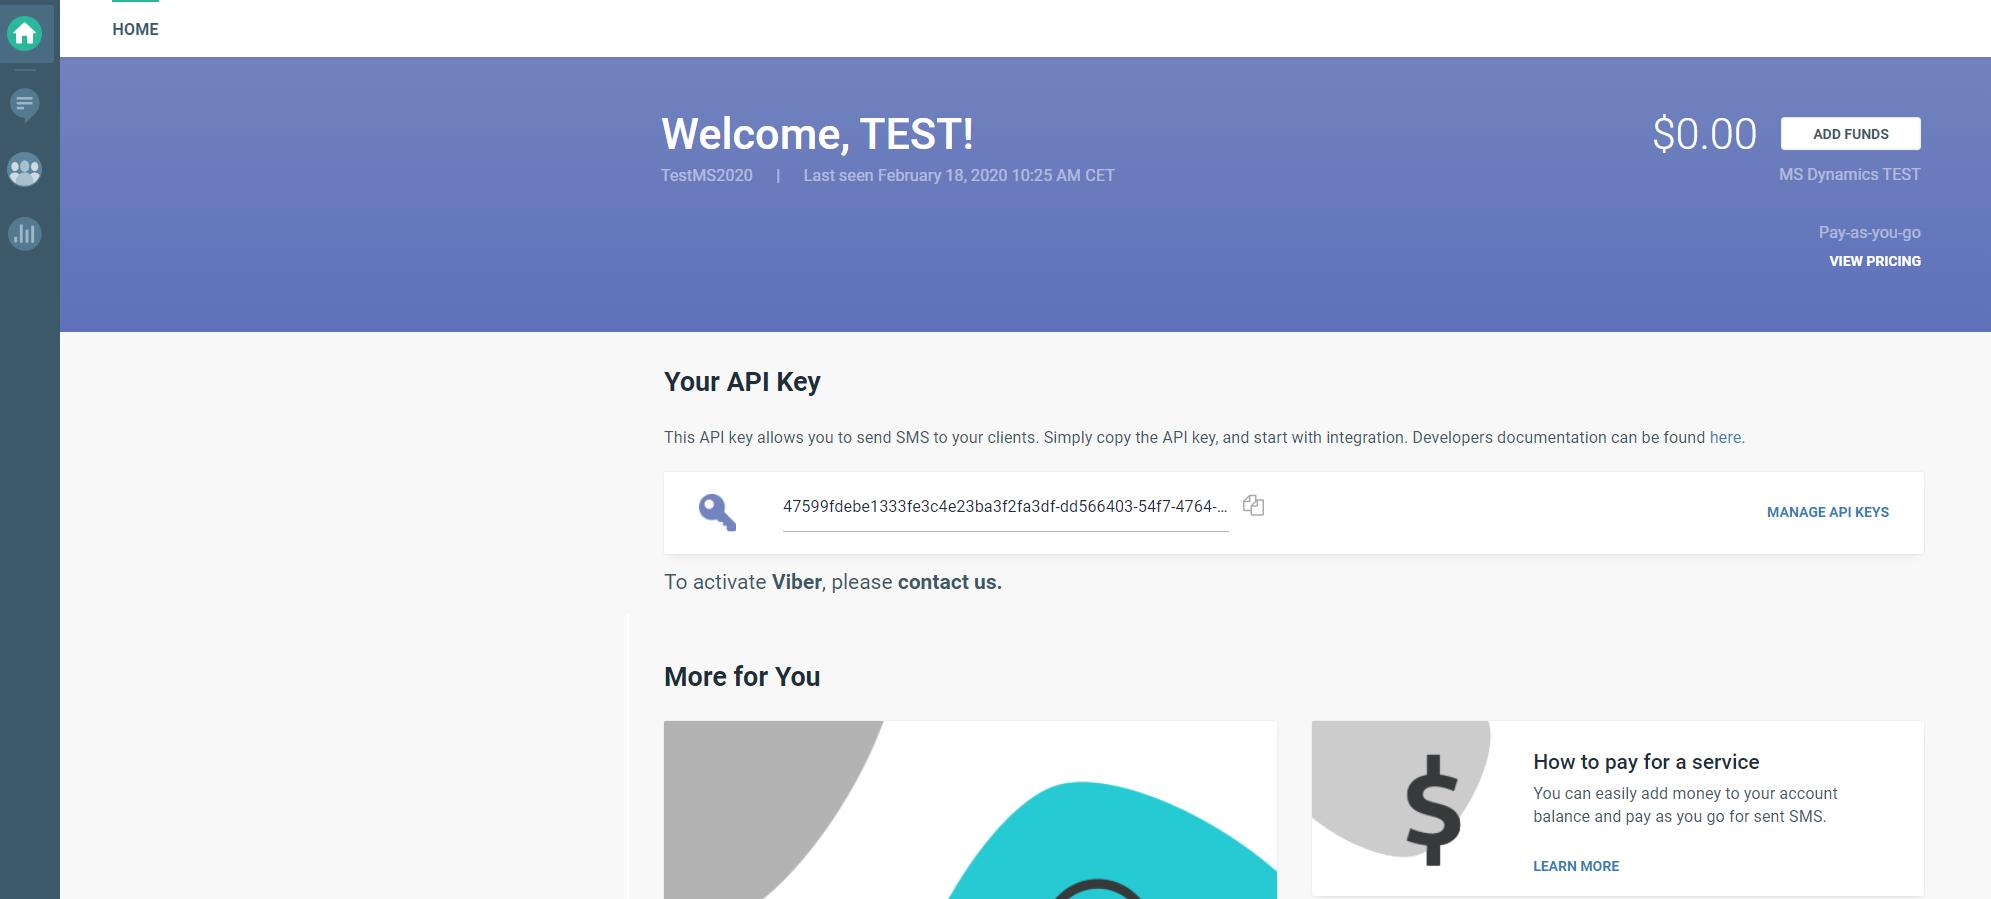 Infobip web interface home page